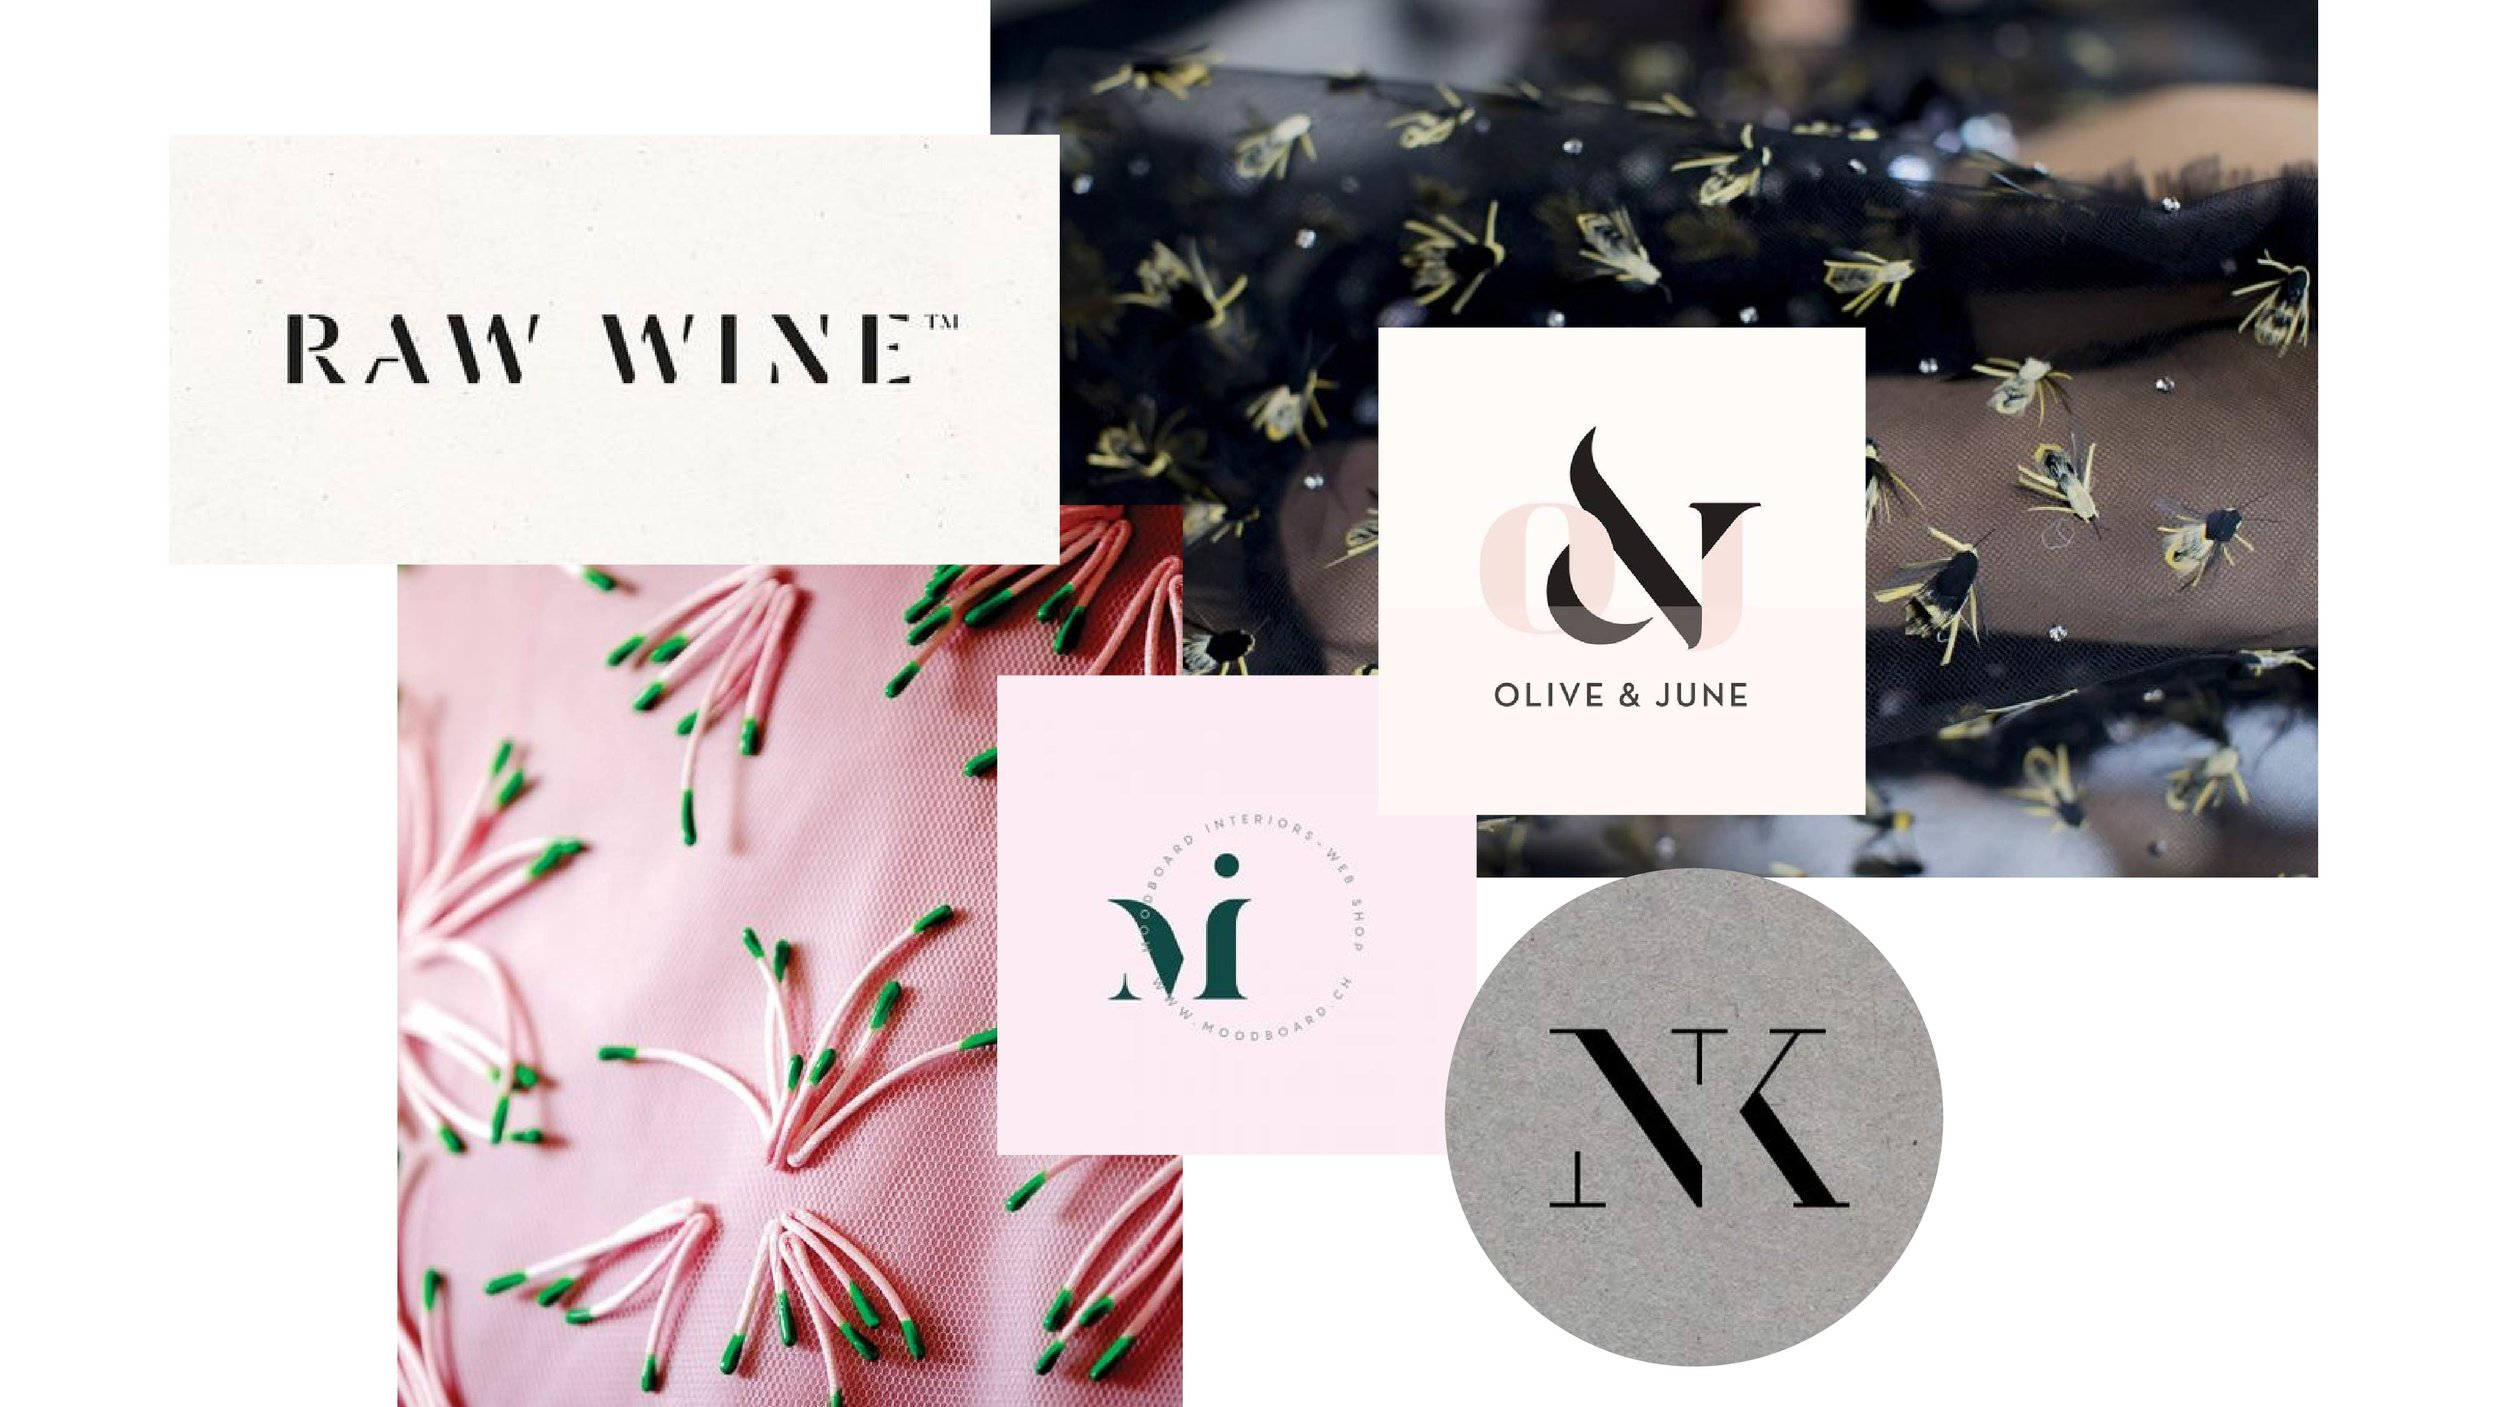 nm-tay-branding-11.jpg